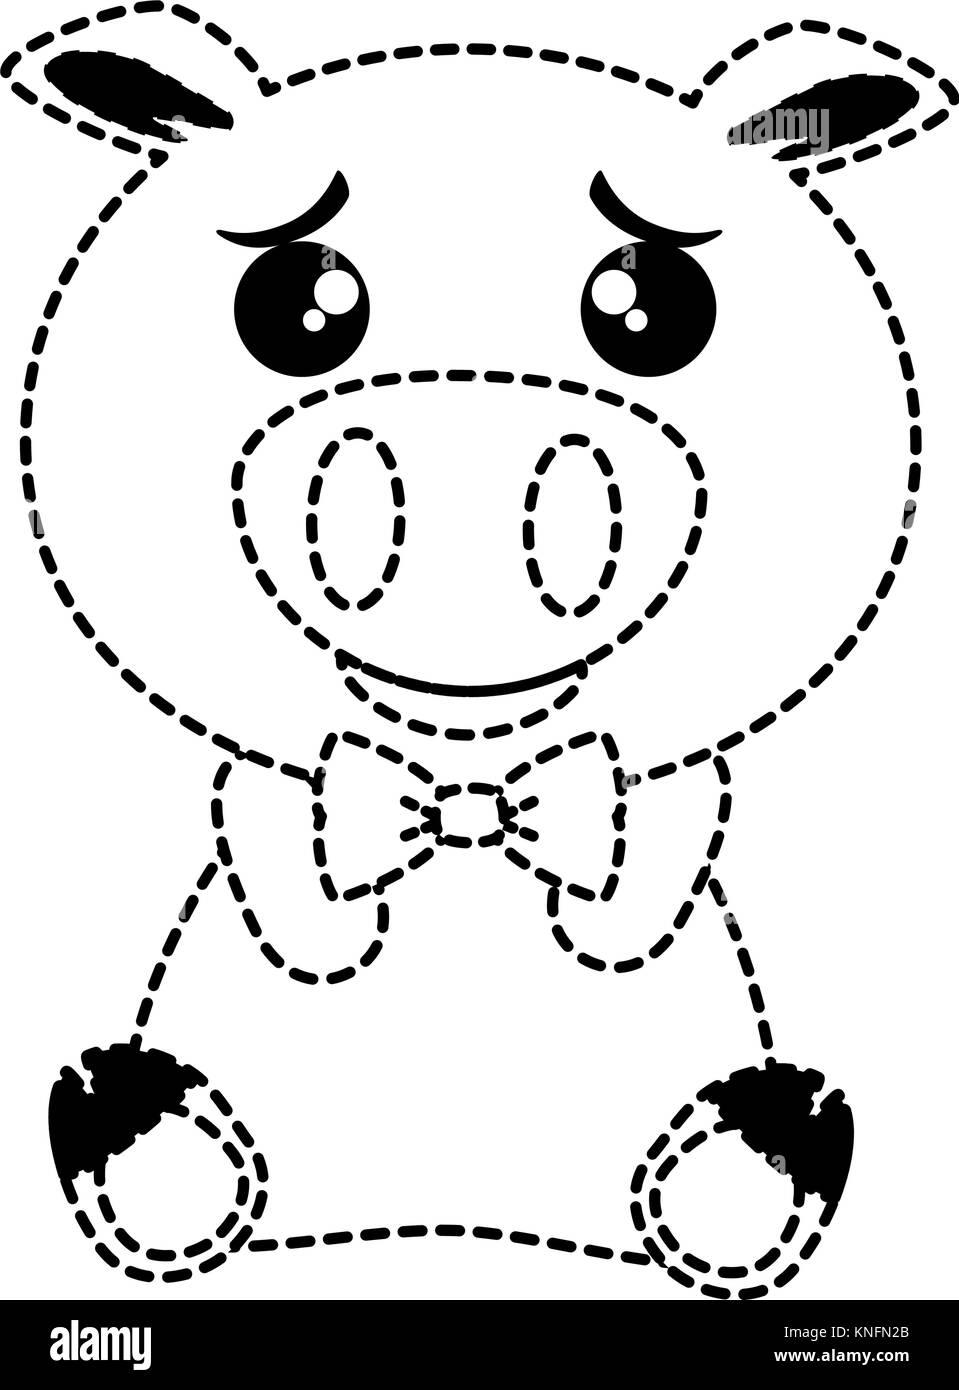 emoji vector vectors cut out stock images pictures alamy New Black Emoji Girl cute pig emoji kawaii vector illustration design stock image